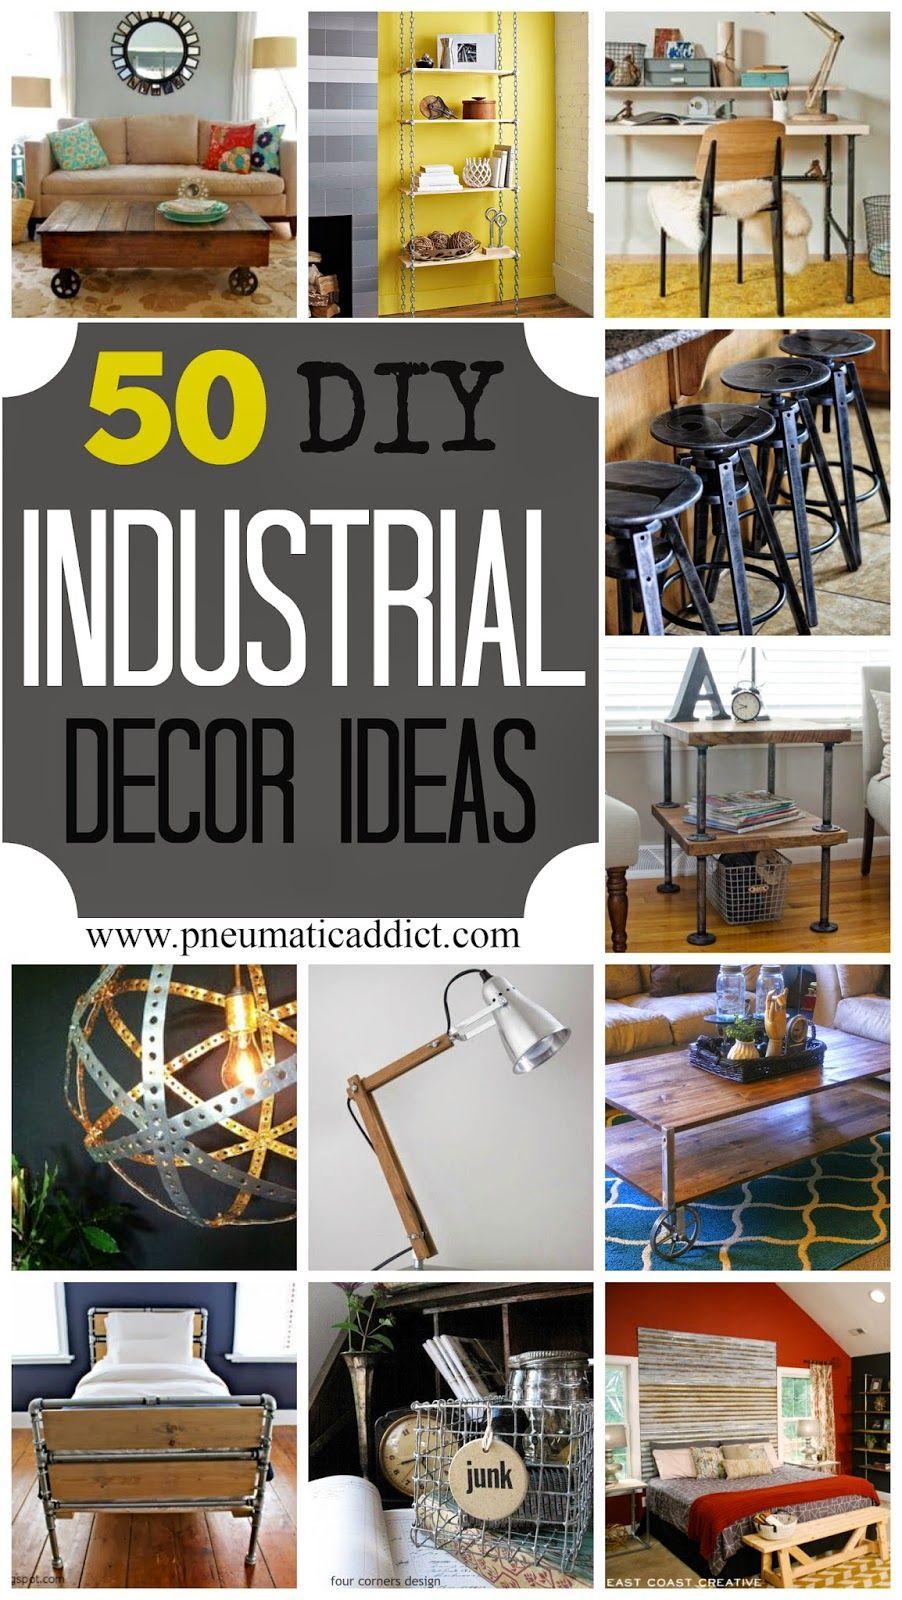 diy industrial decor ideas pneumaticaddict also home muebles decoracion hogar rh ar pinterest